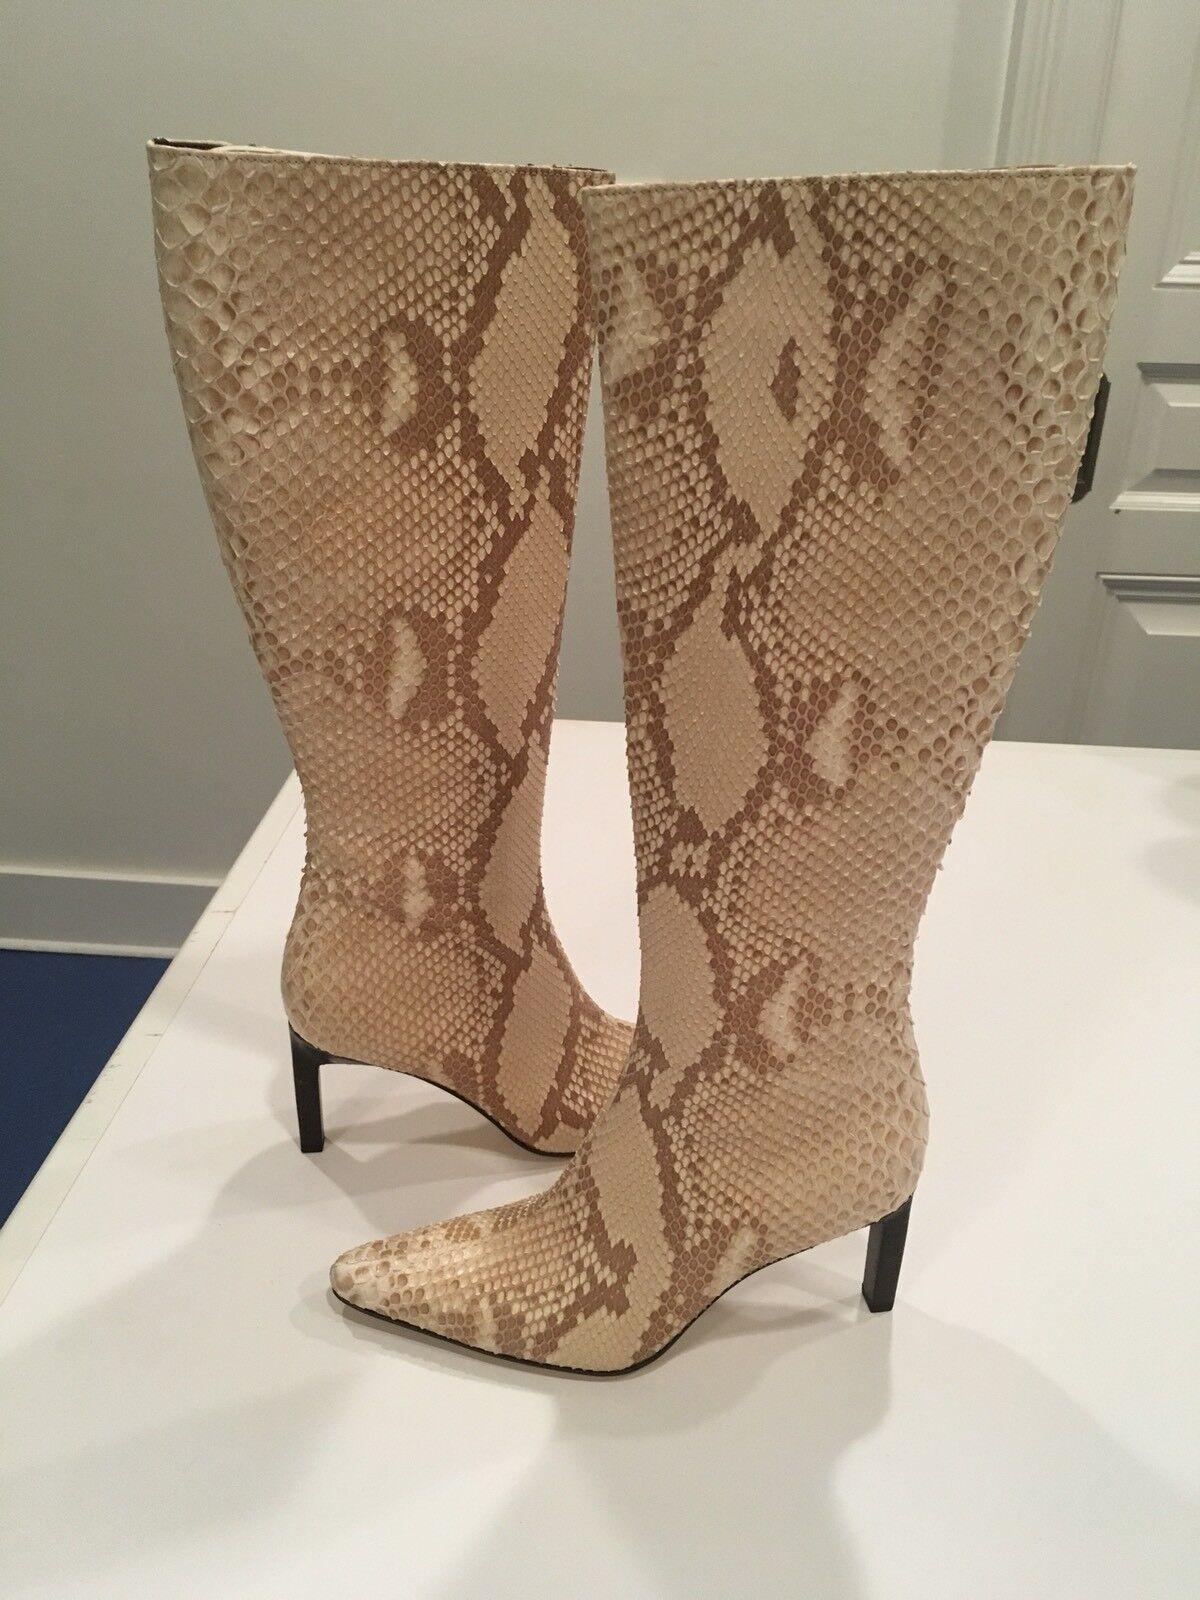 NIB Ralph Lauren Brenda Blond Python Snake Skin  Leather stivali Sz 6.5B, Orig  1100  rivenditore di fitness